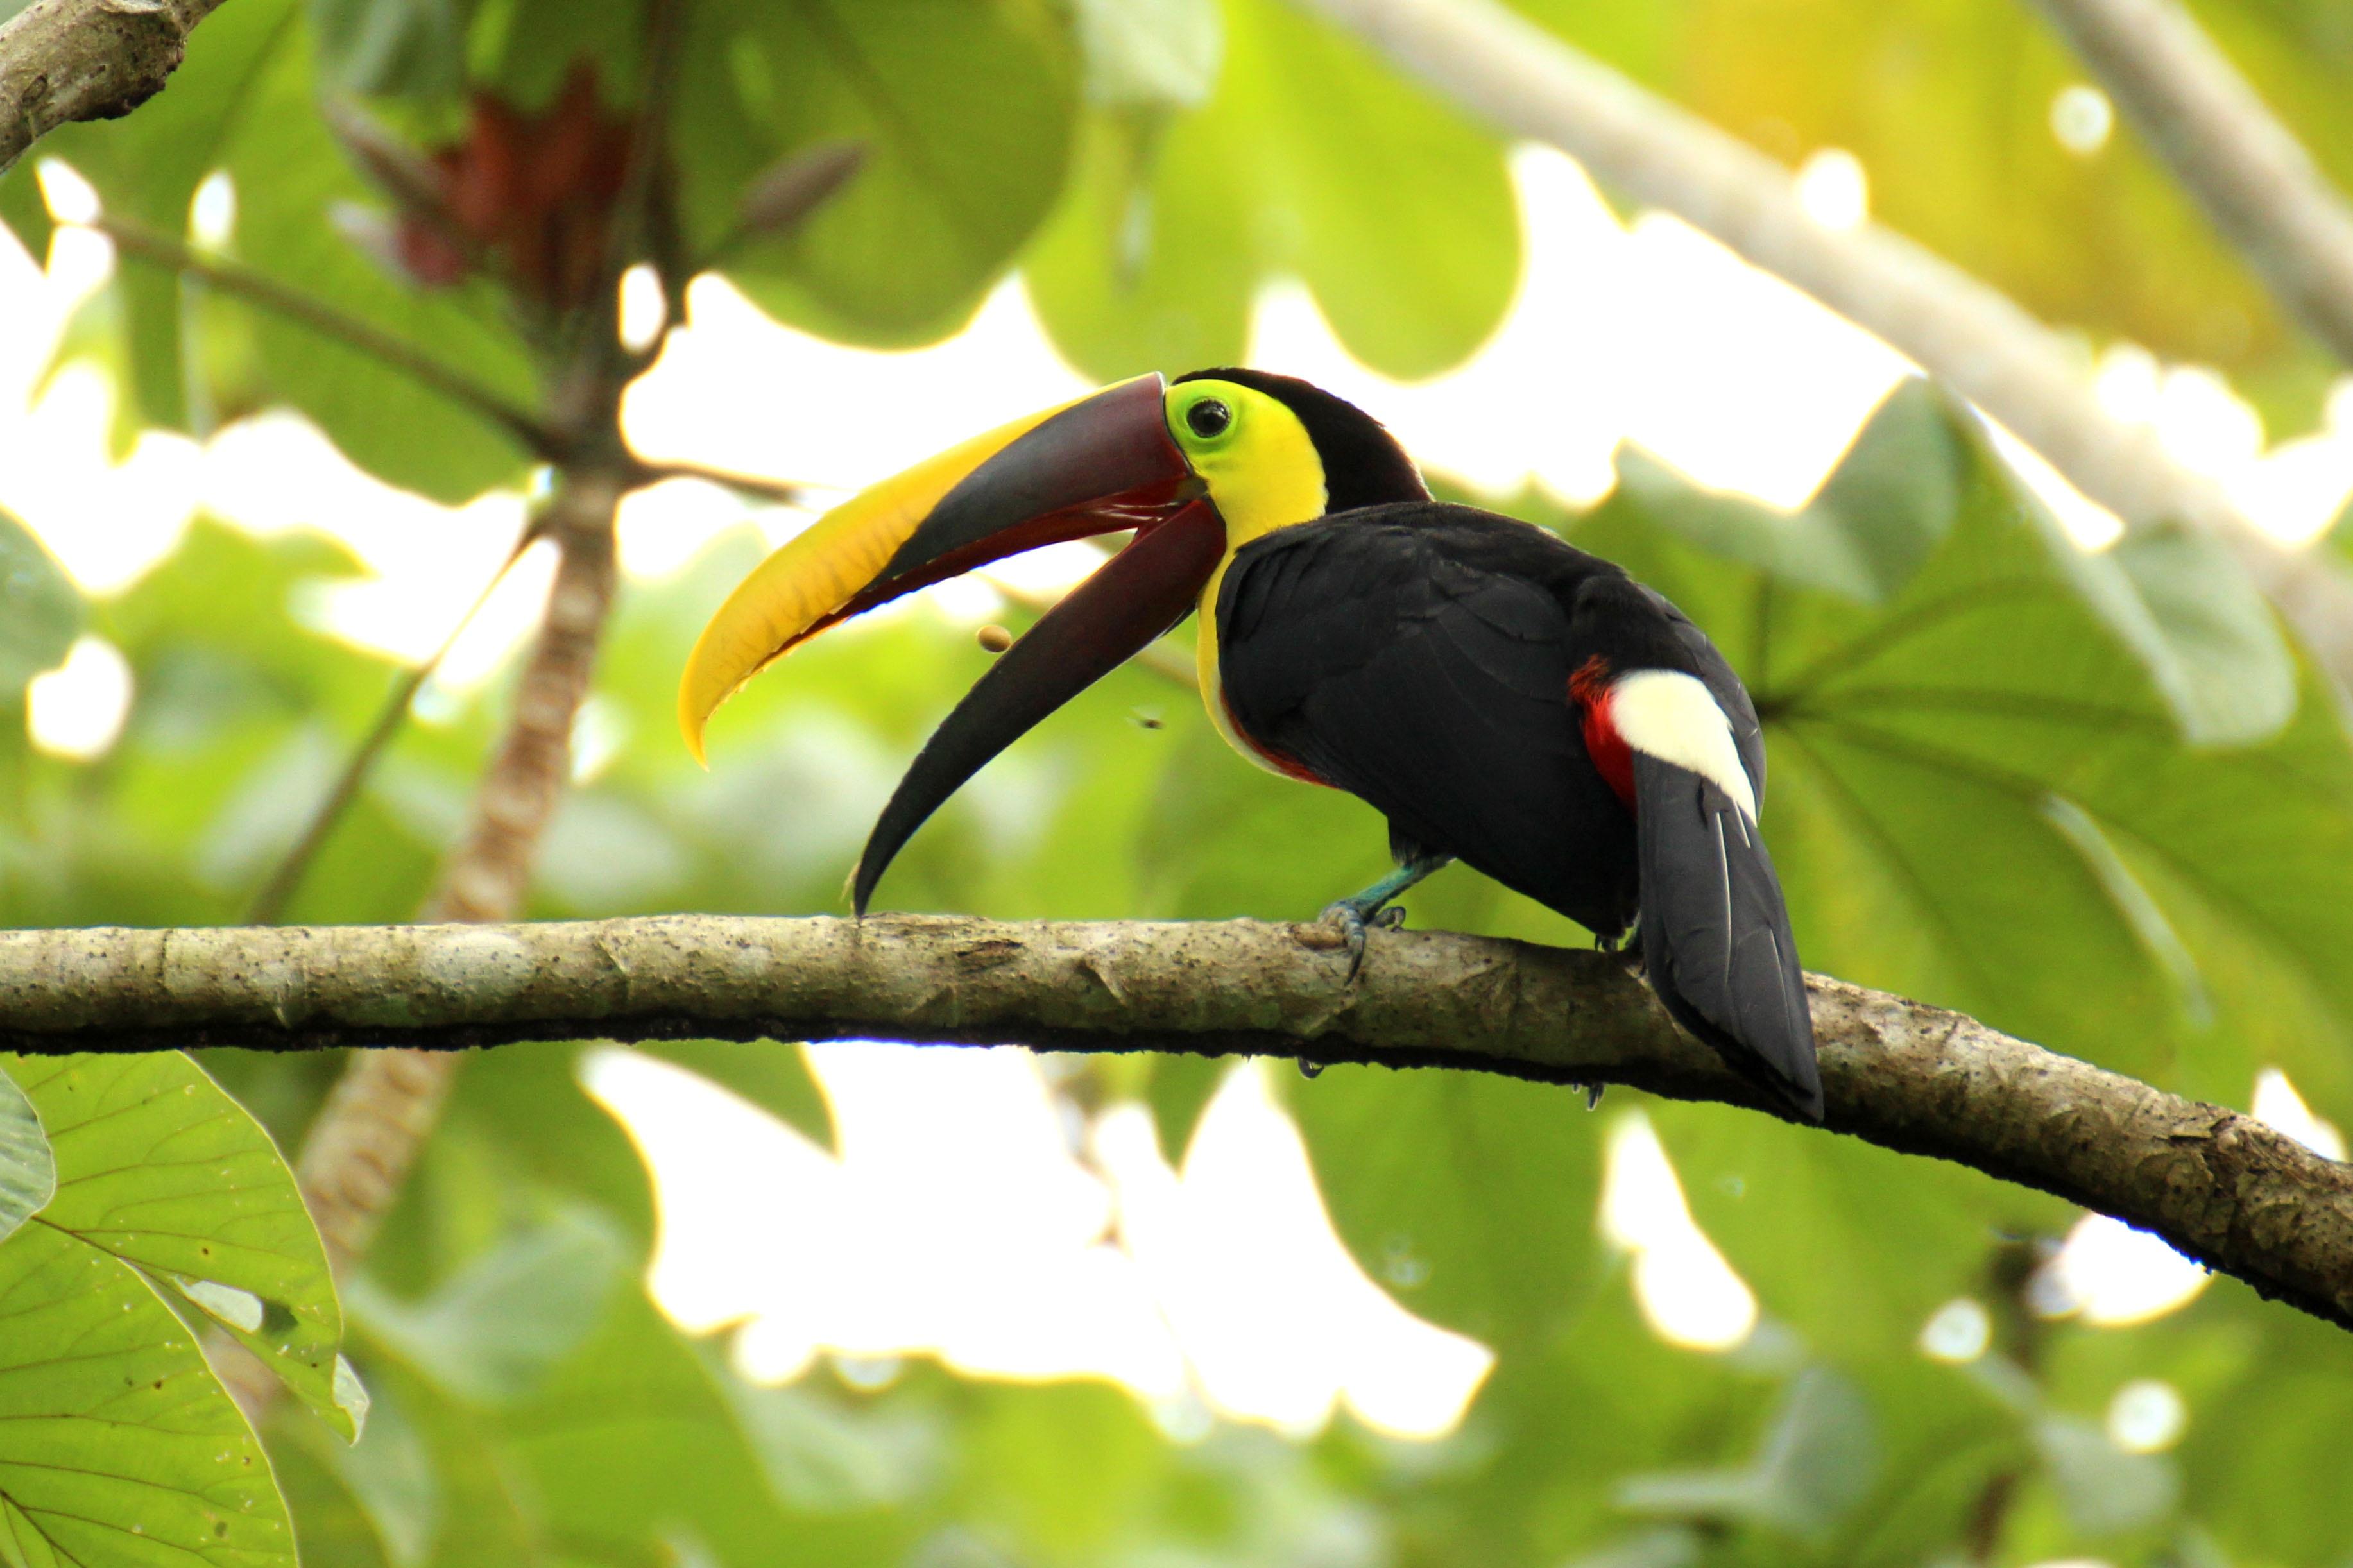 Fotos de aves hermosas 2